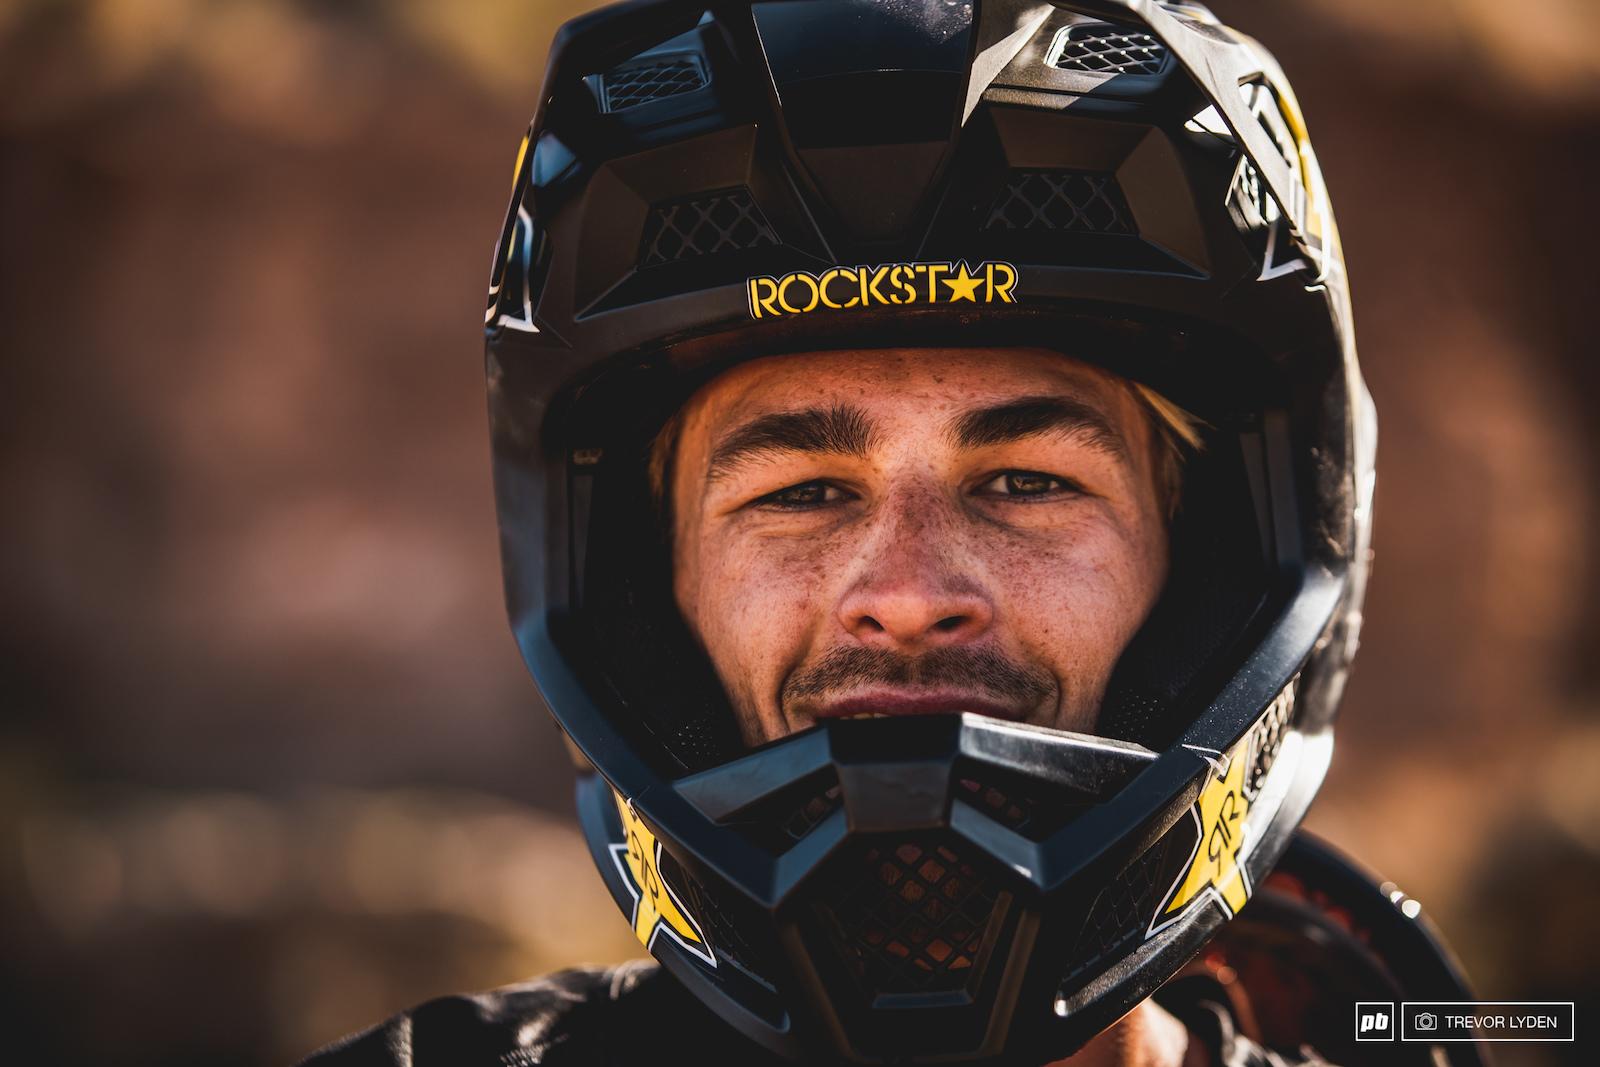 DJ Brandt with his brand new Rockstar helmet.